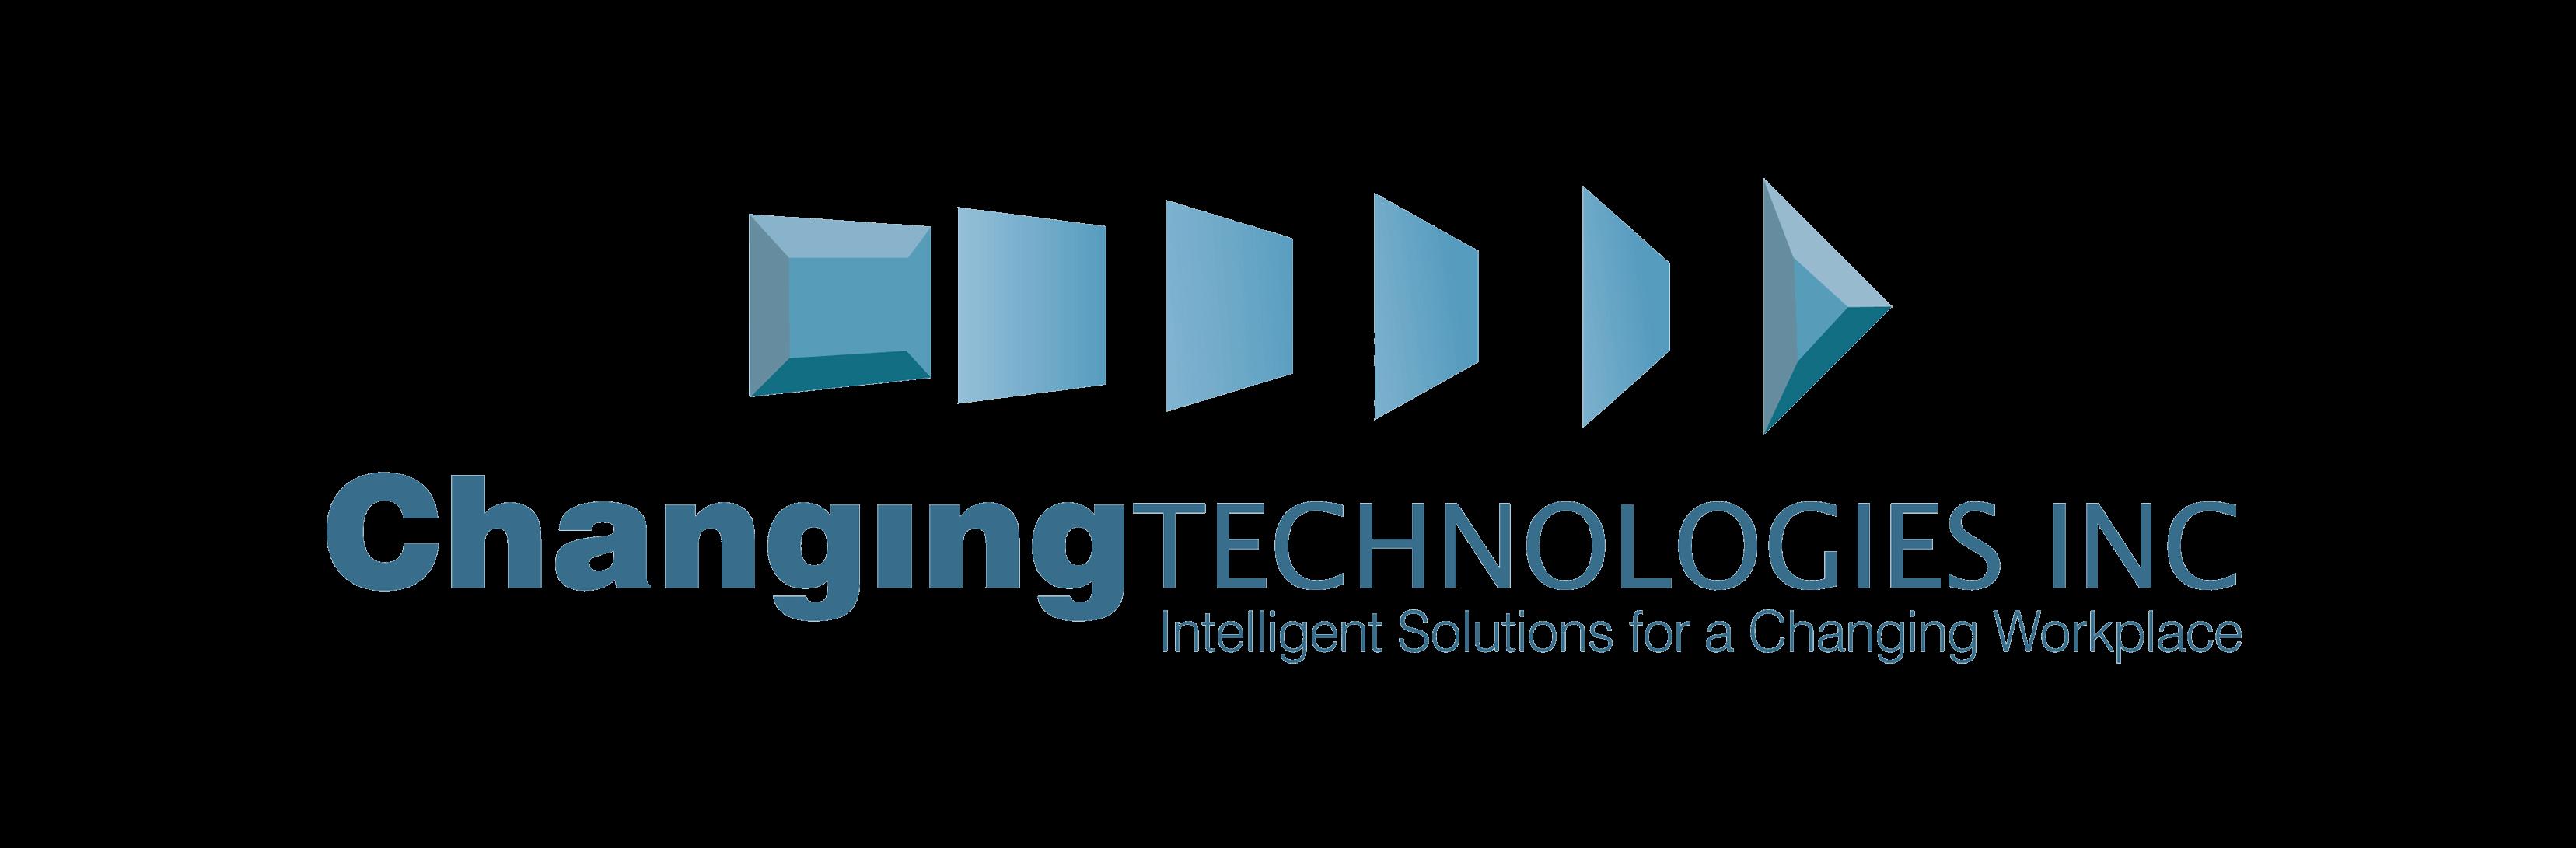 Changing Technologies Inc.